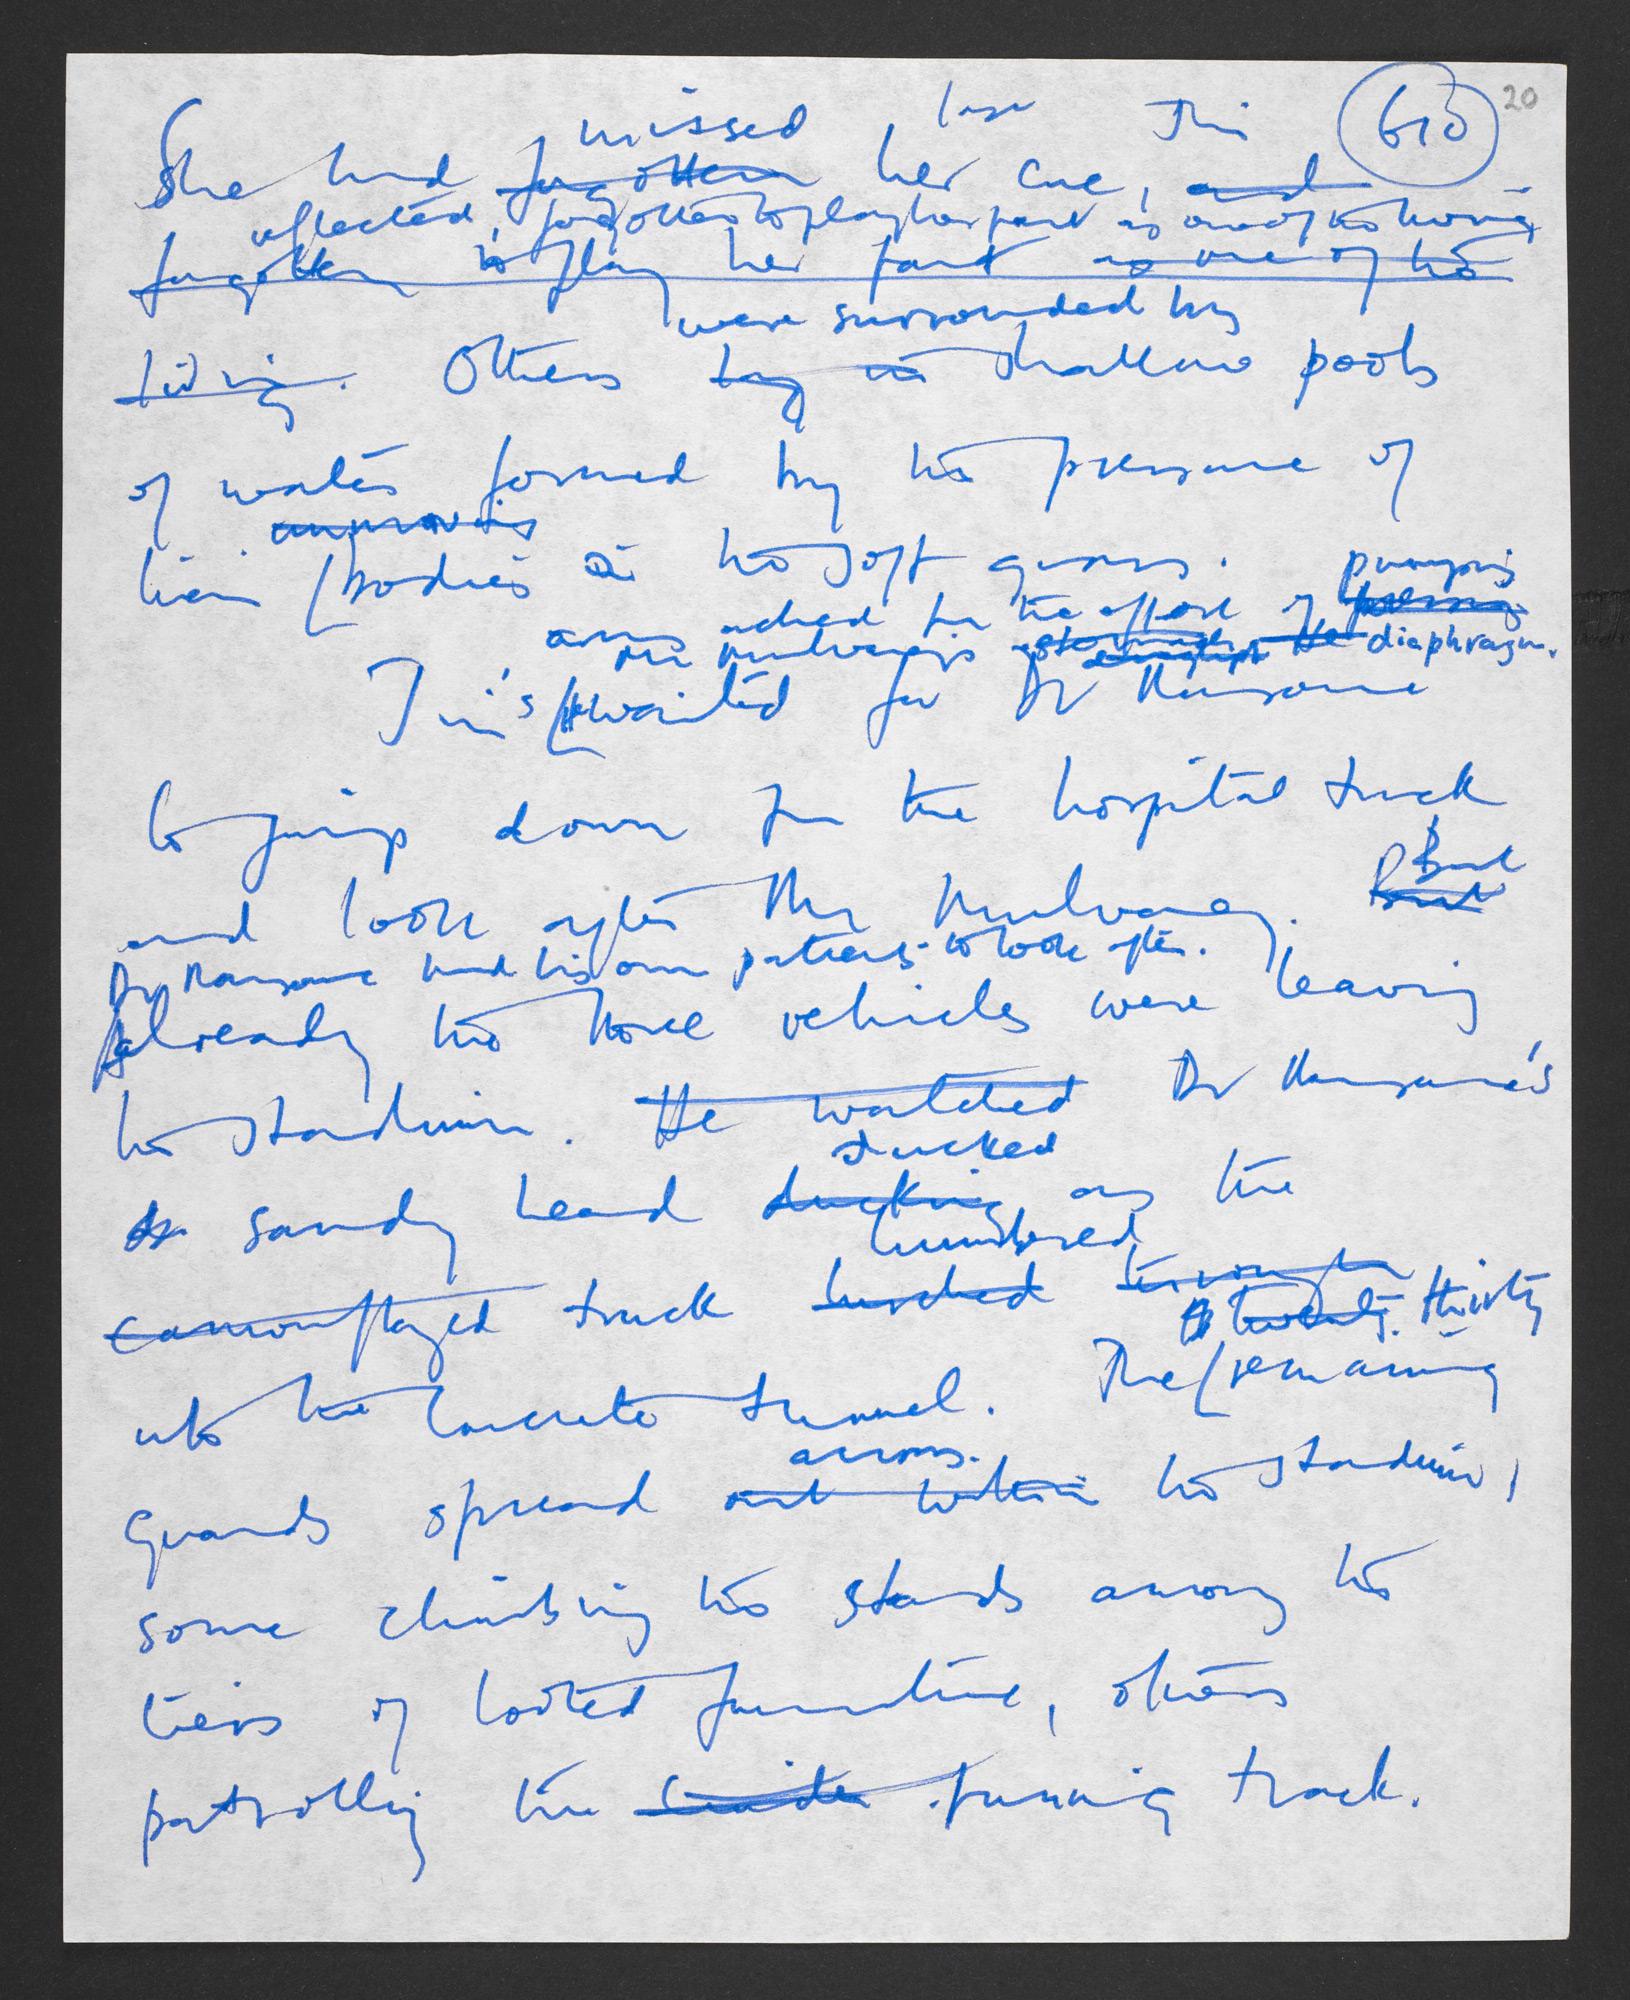 Manuscript draft of Empire of the Sun by J G Ballard